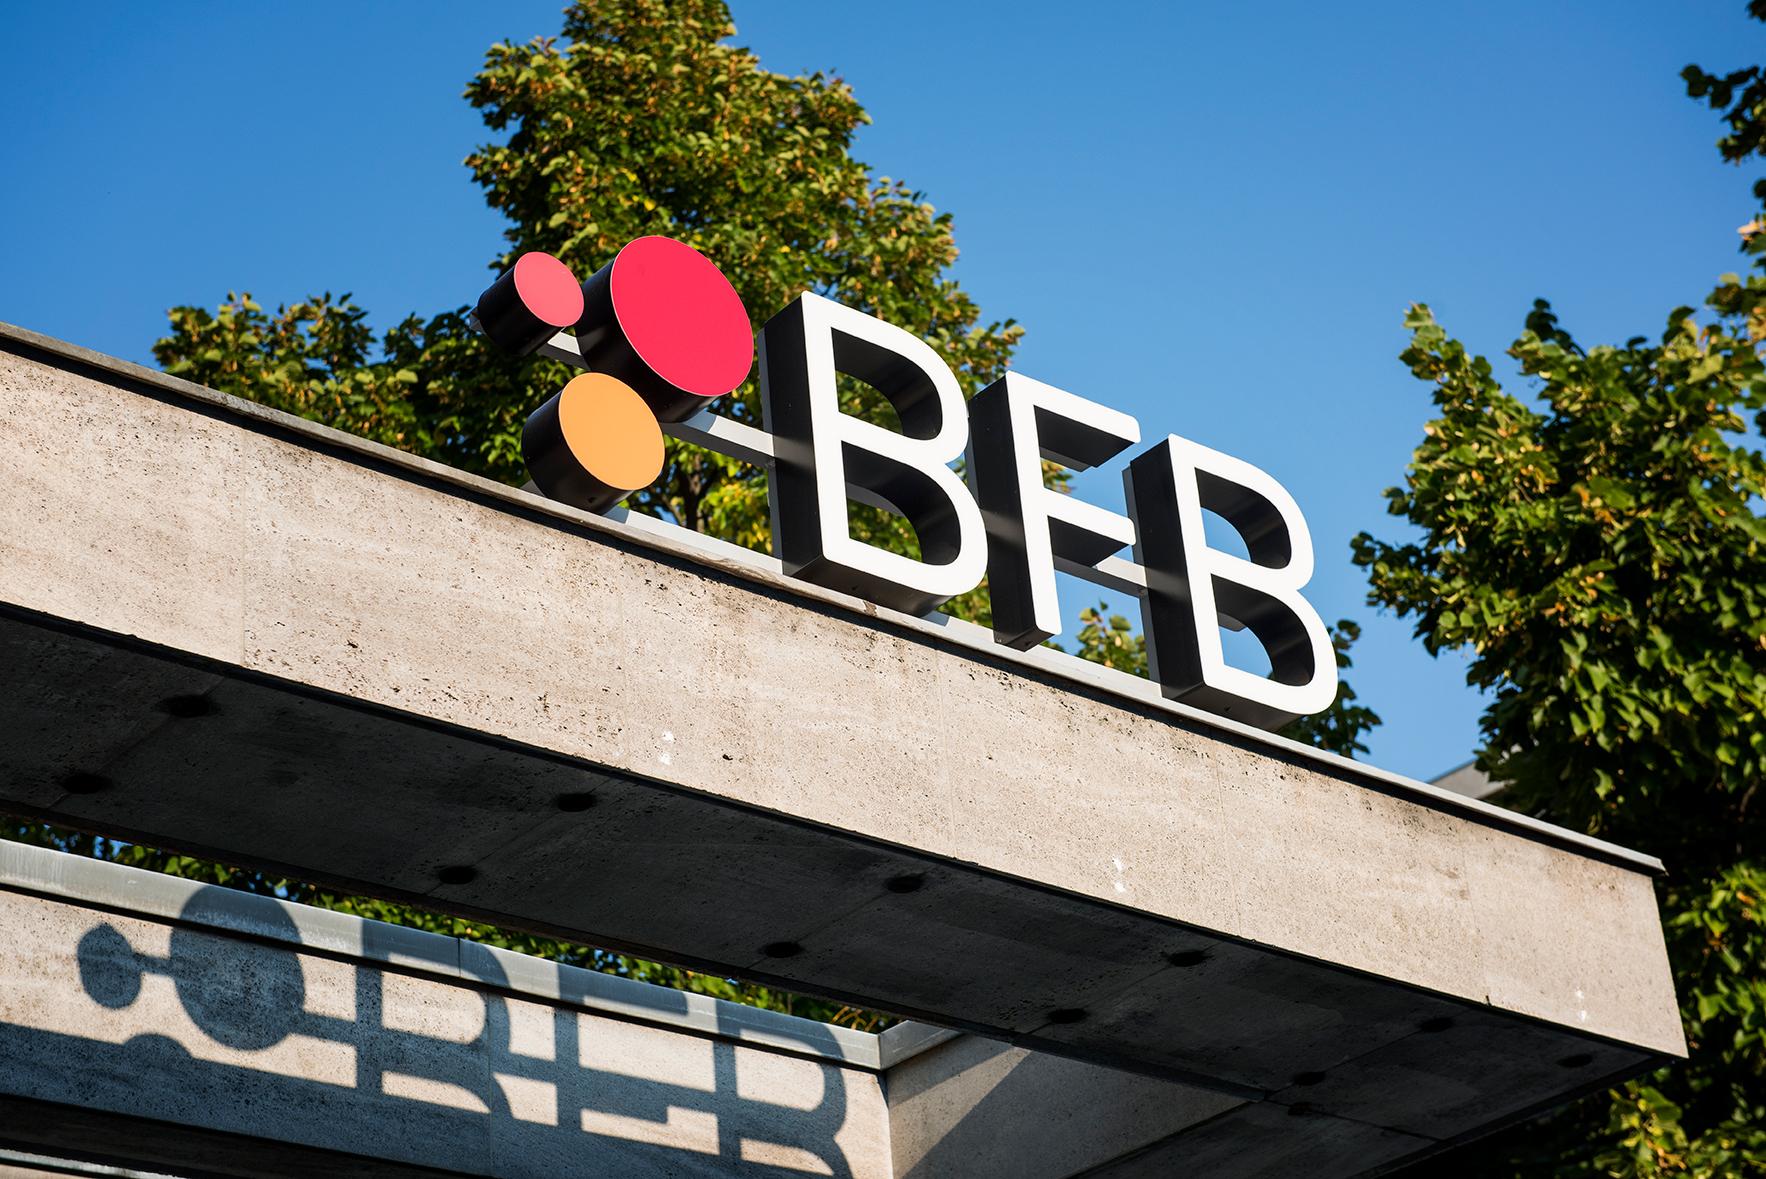 Fotos de BFB BestMedia4Berlin GmbH